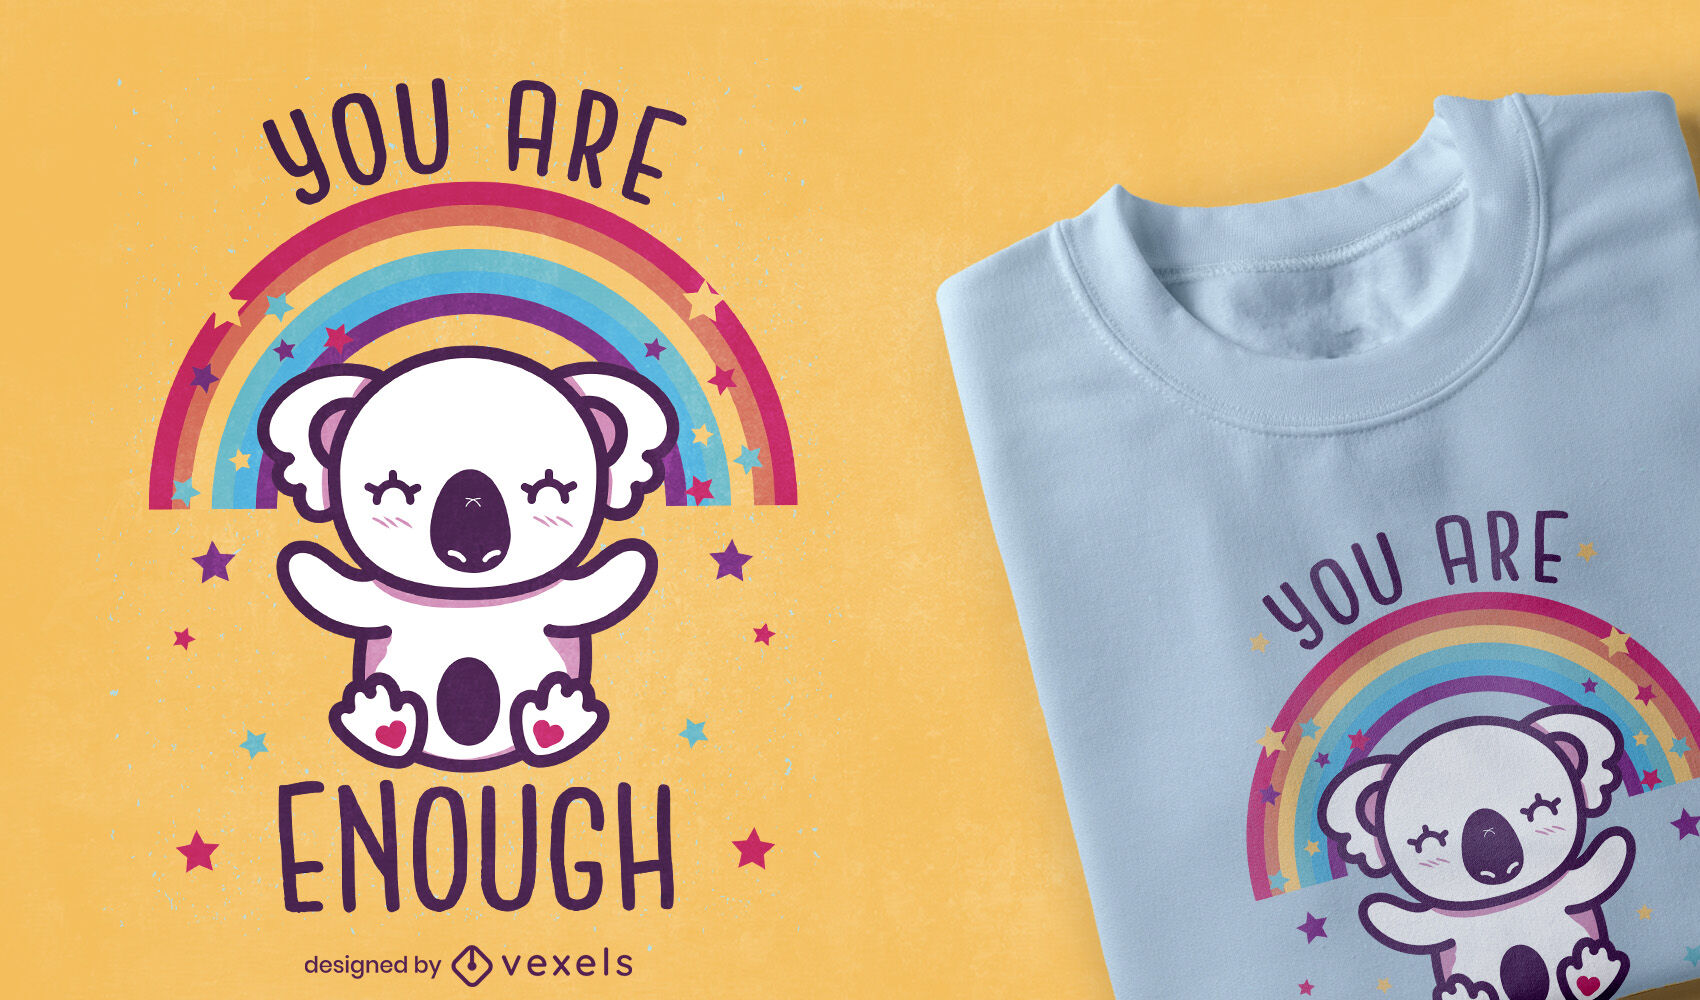 Design de t-shirt coala fofa motivacional